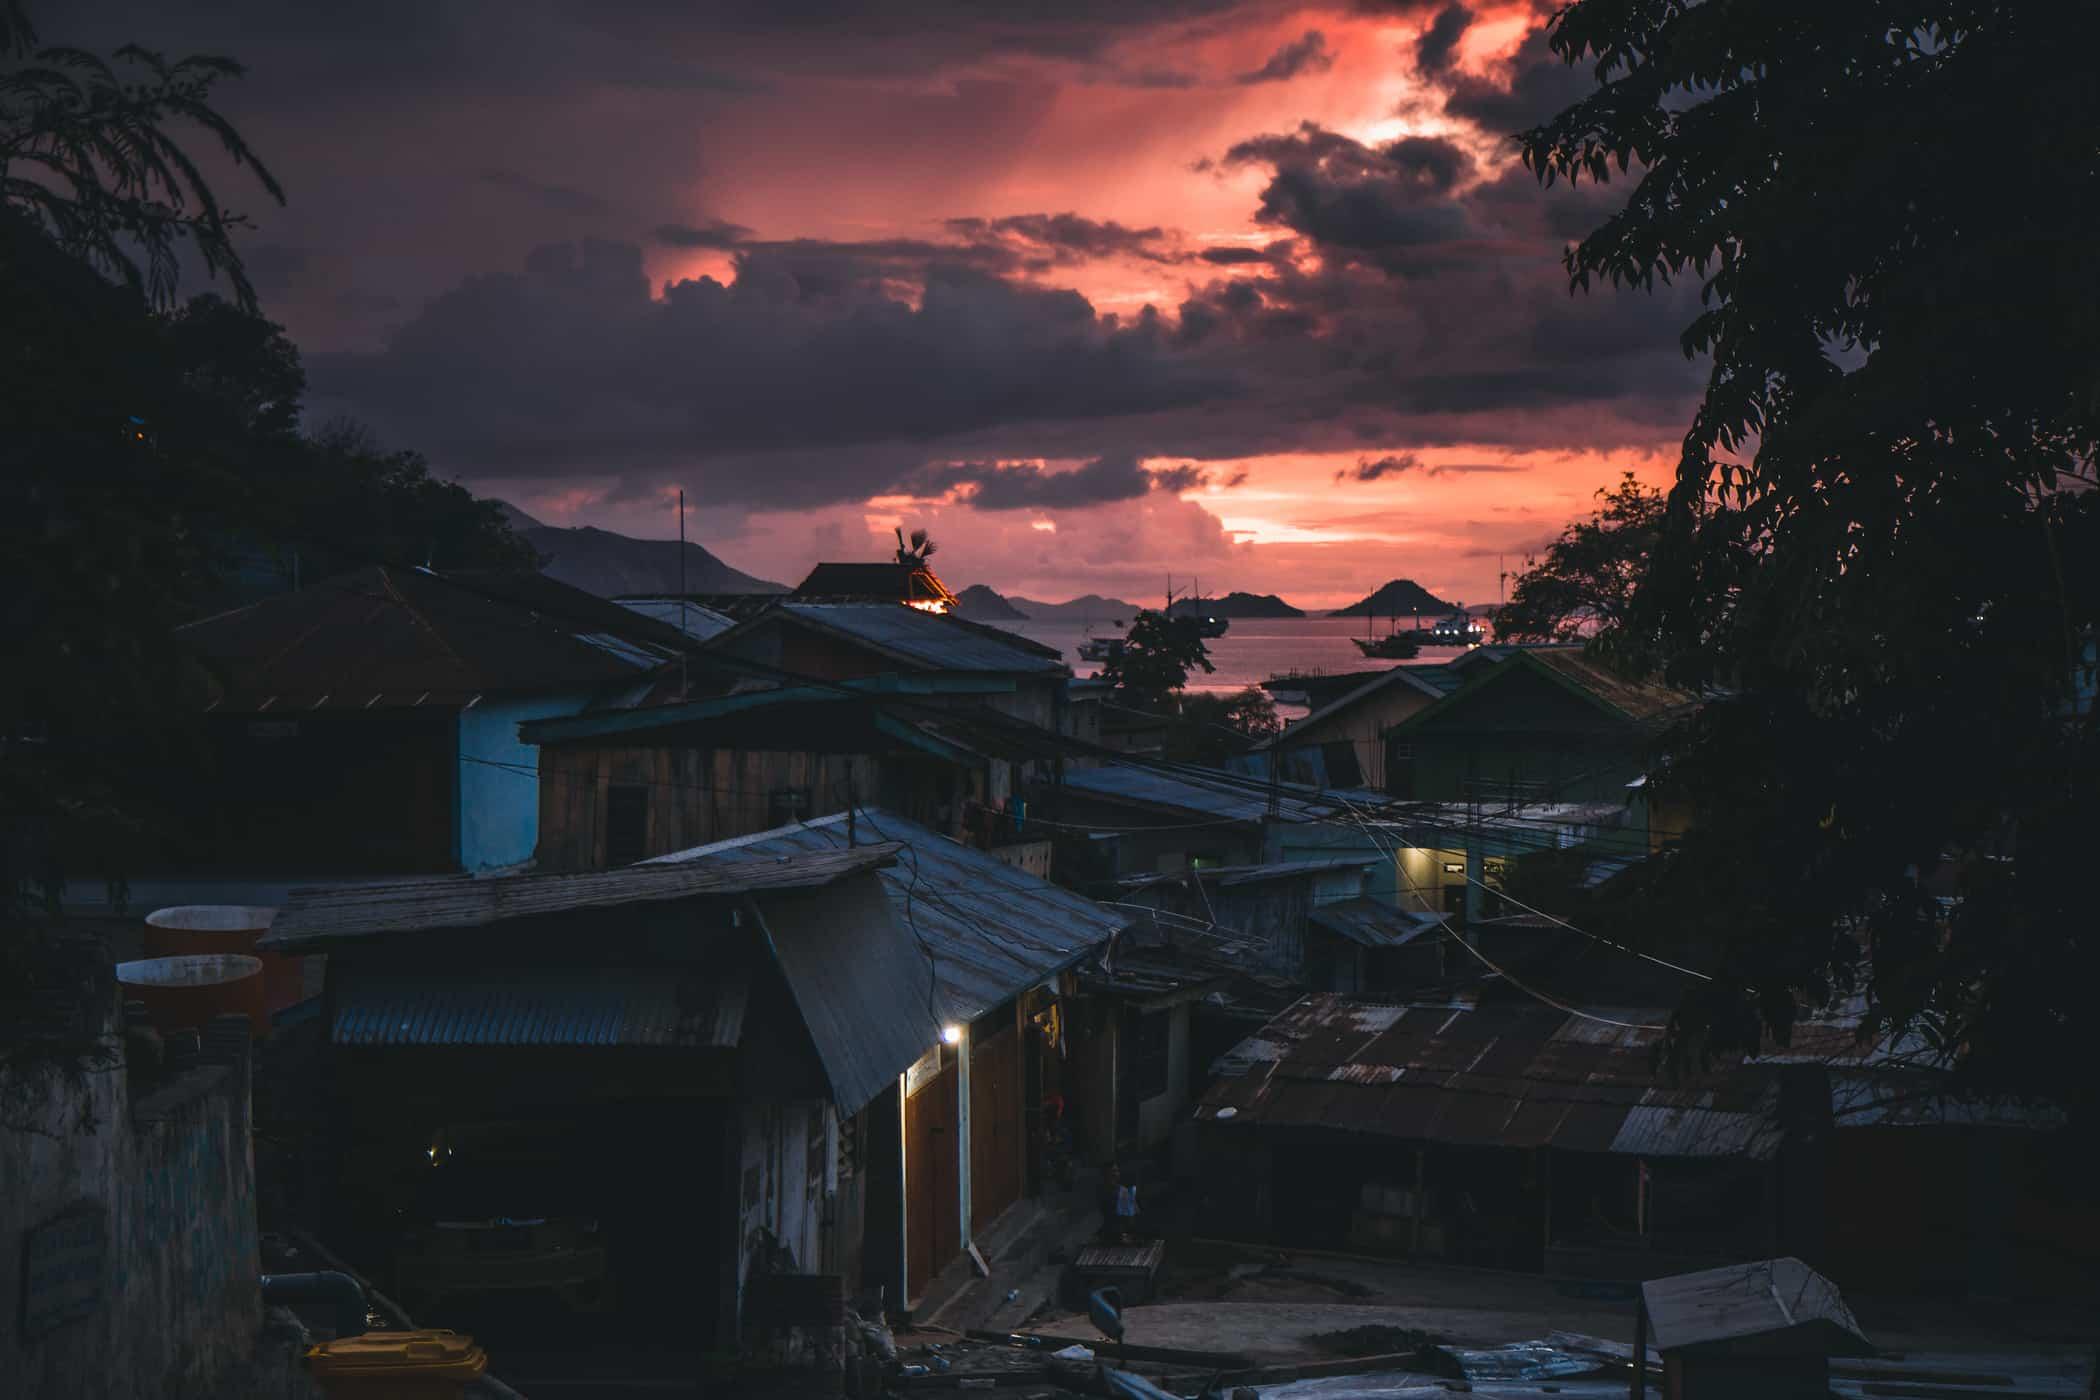 The Sun Sets Over Lebuan Bajo